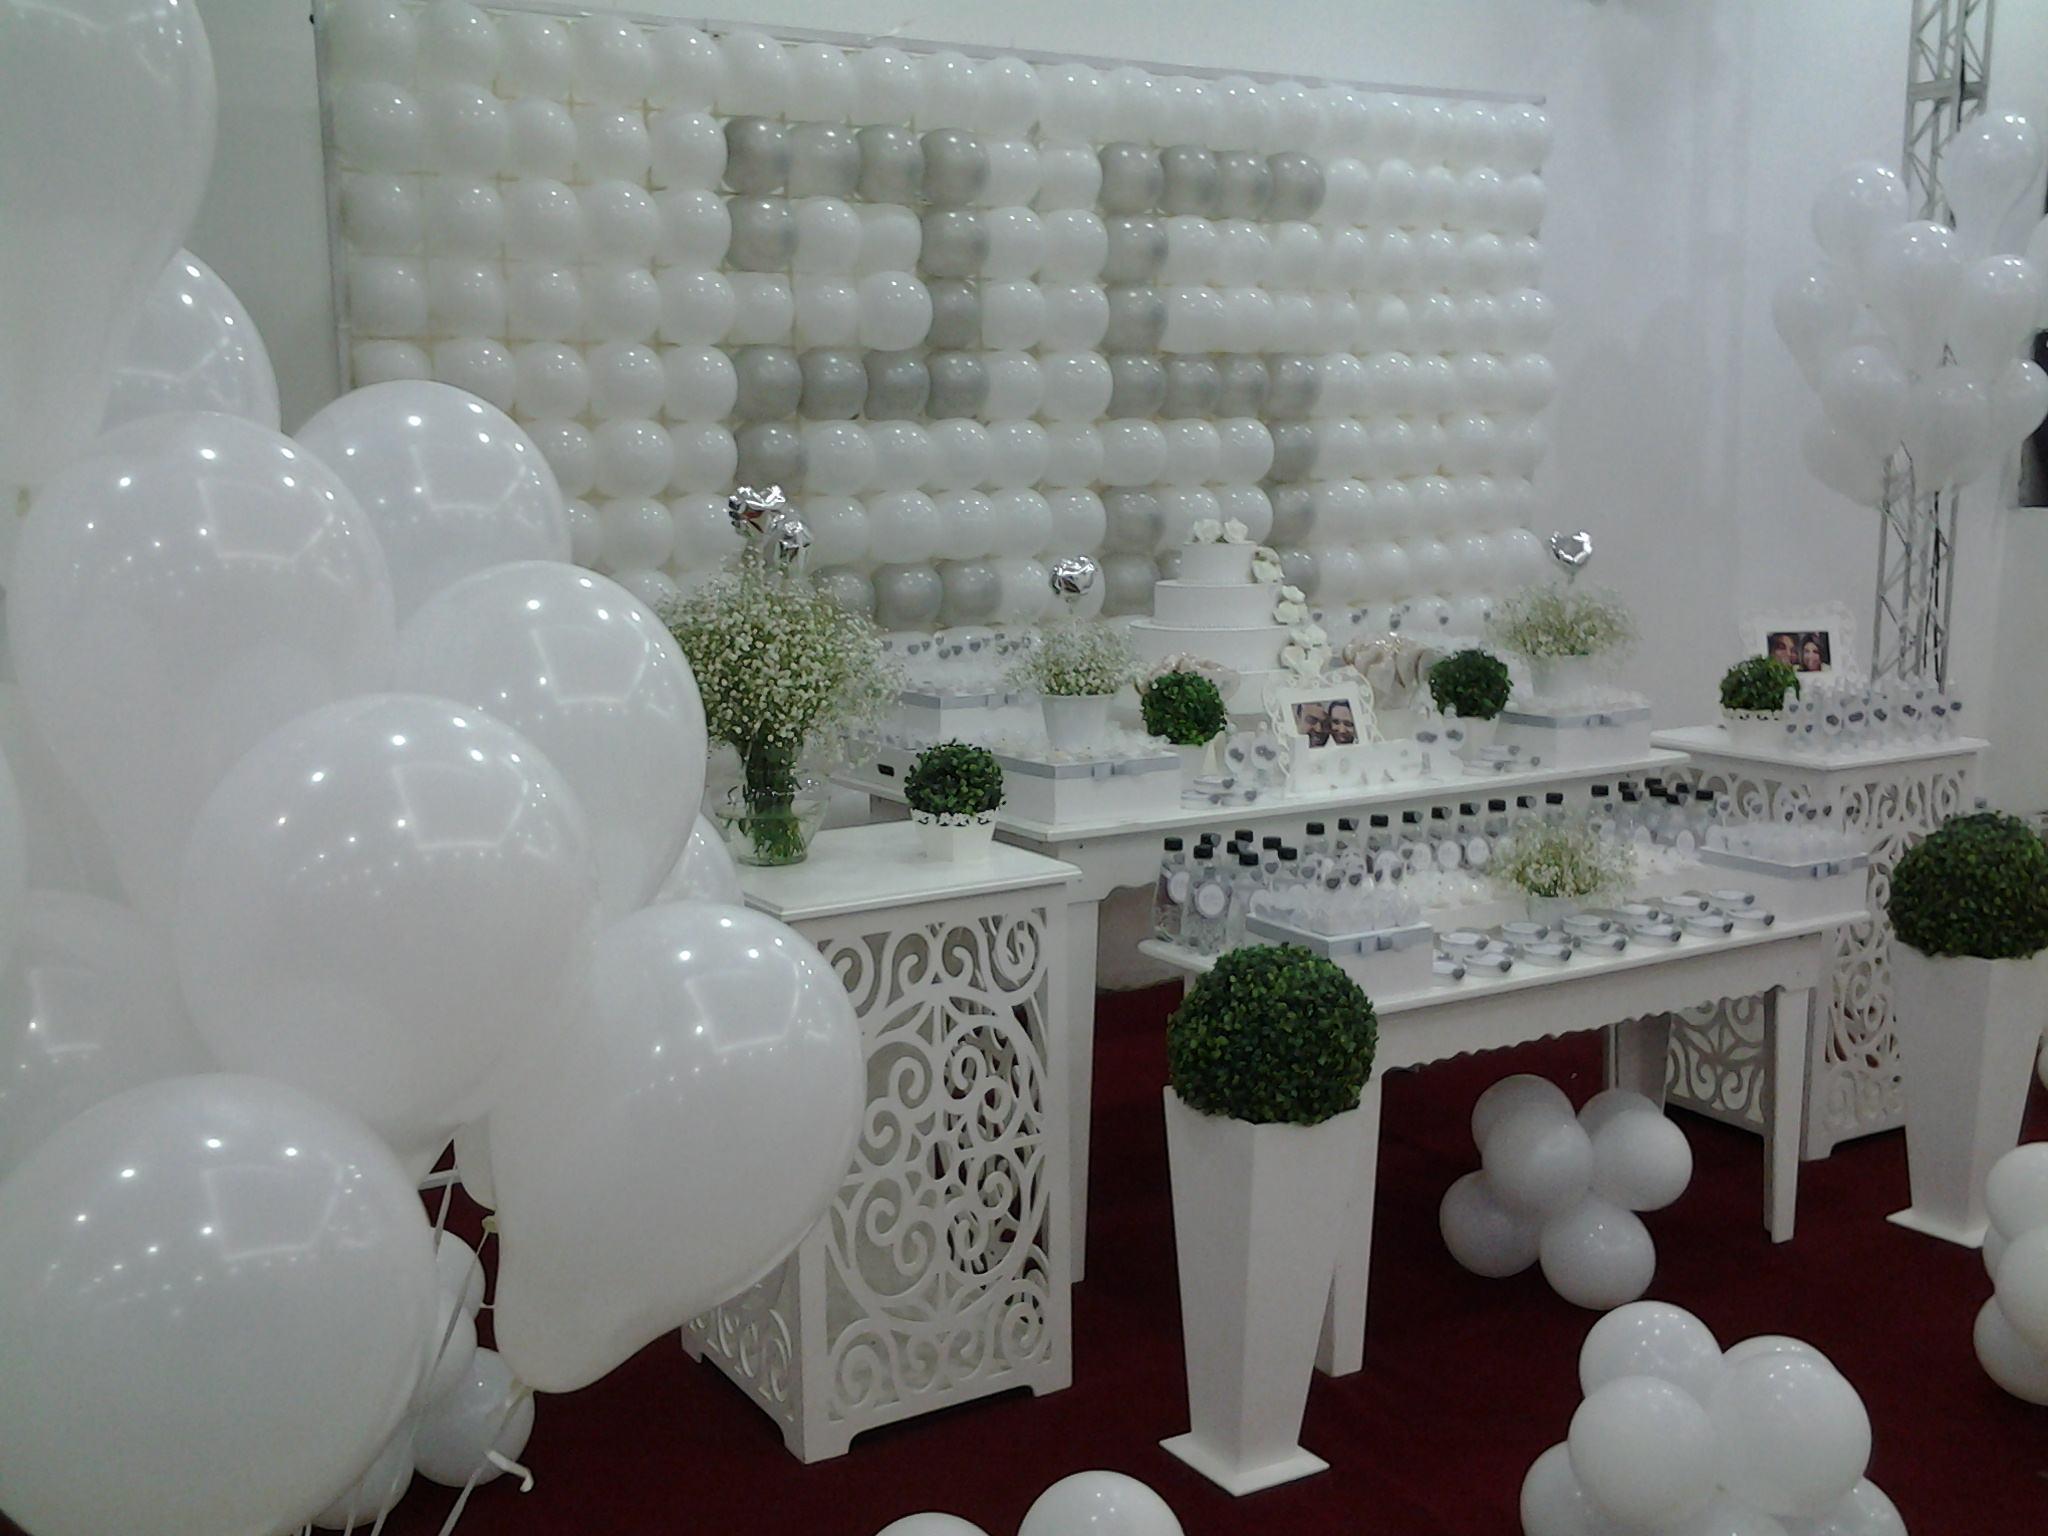 decoracao-bodas-de-prata-bodas